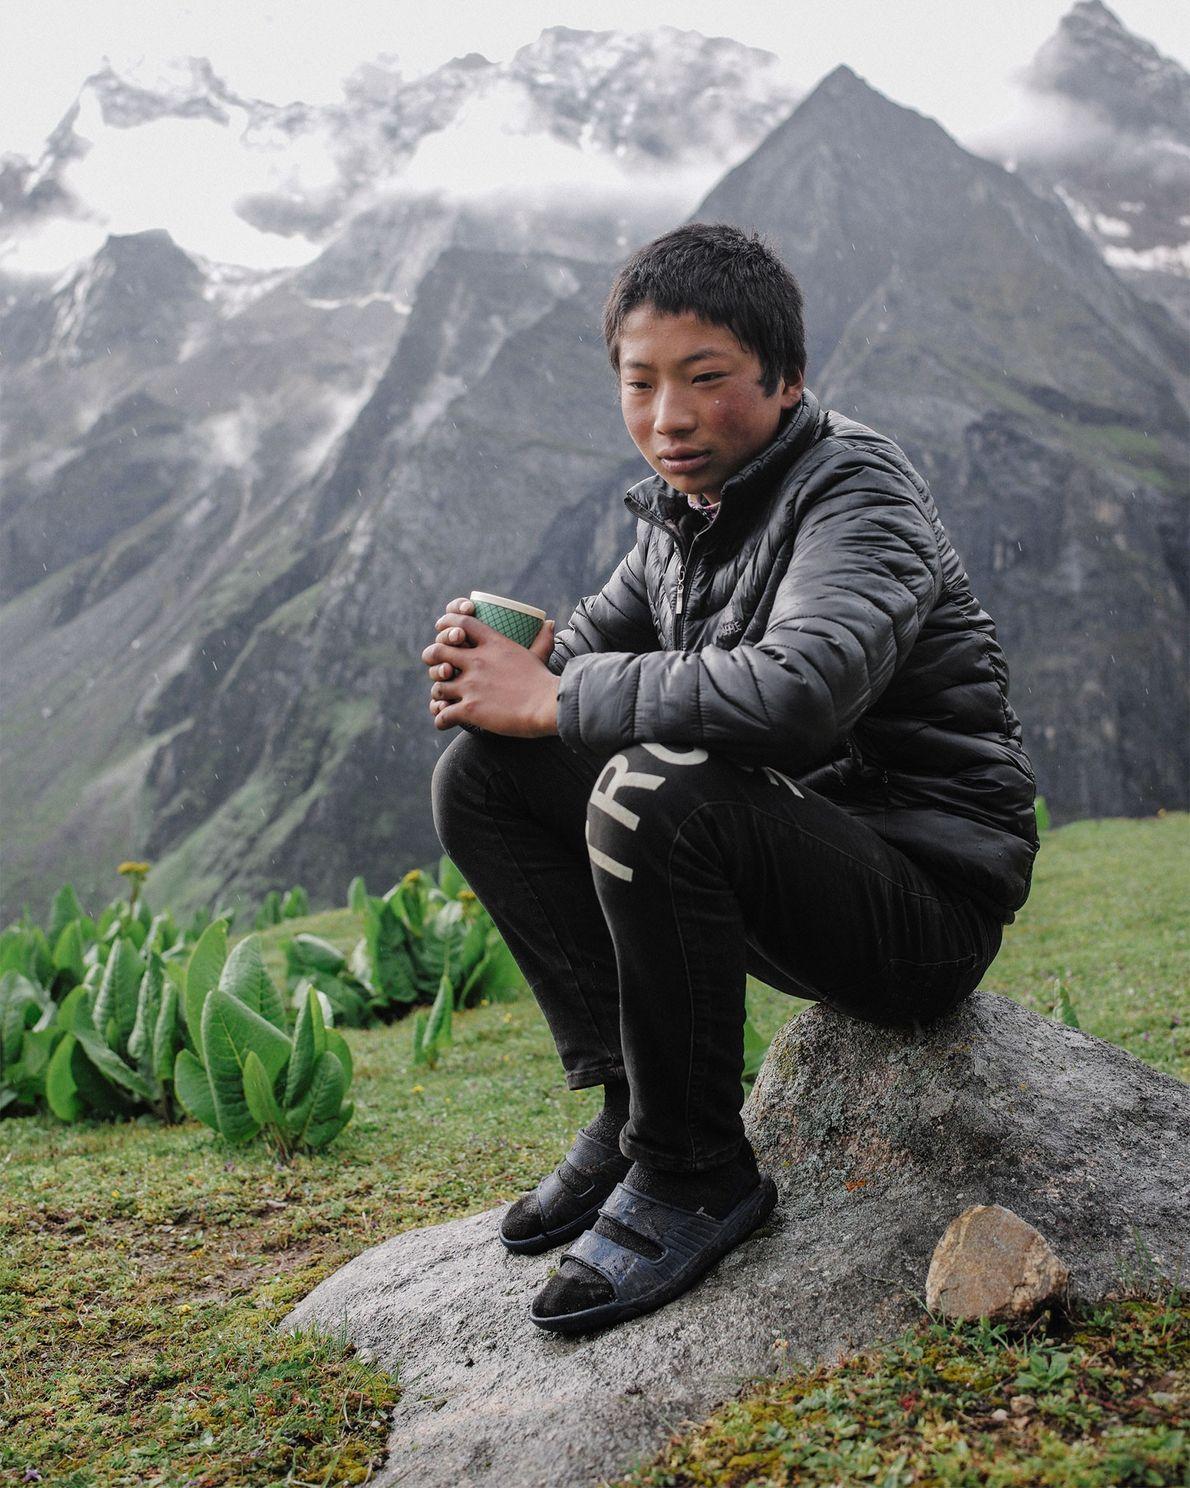 Fifteen-year-old Karma Tenzin is a 7th-grader in Laya. Unlike his nomadic yak-herding parents, Karma wants to ...